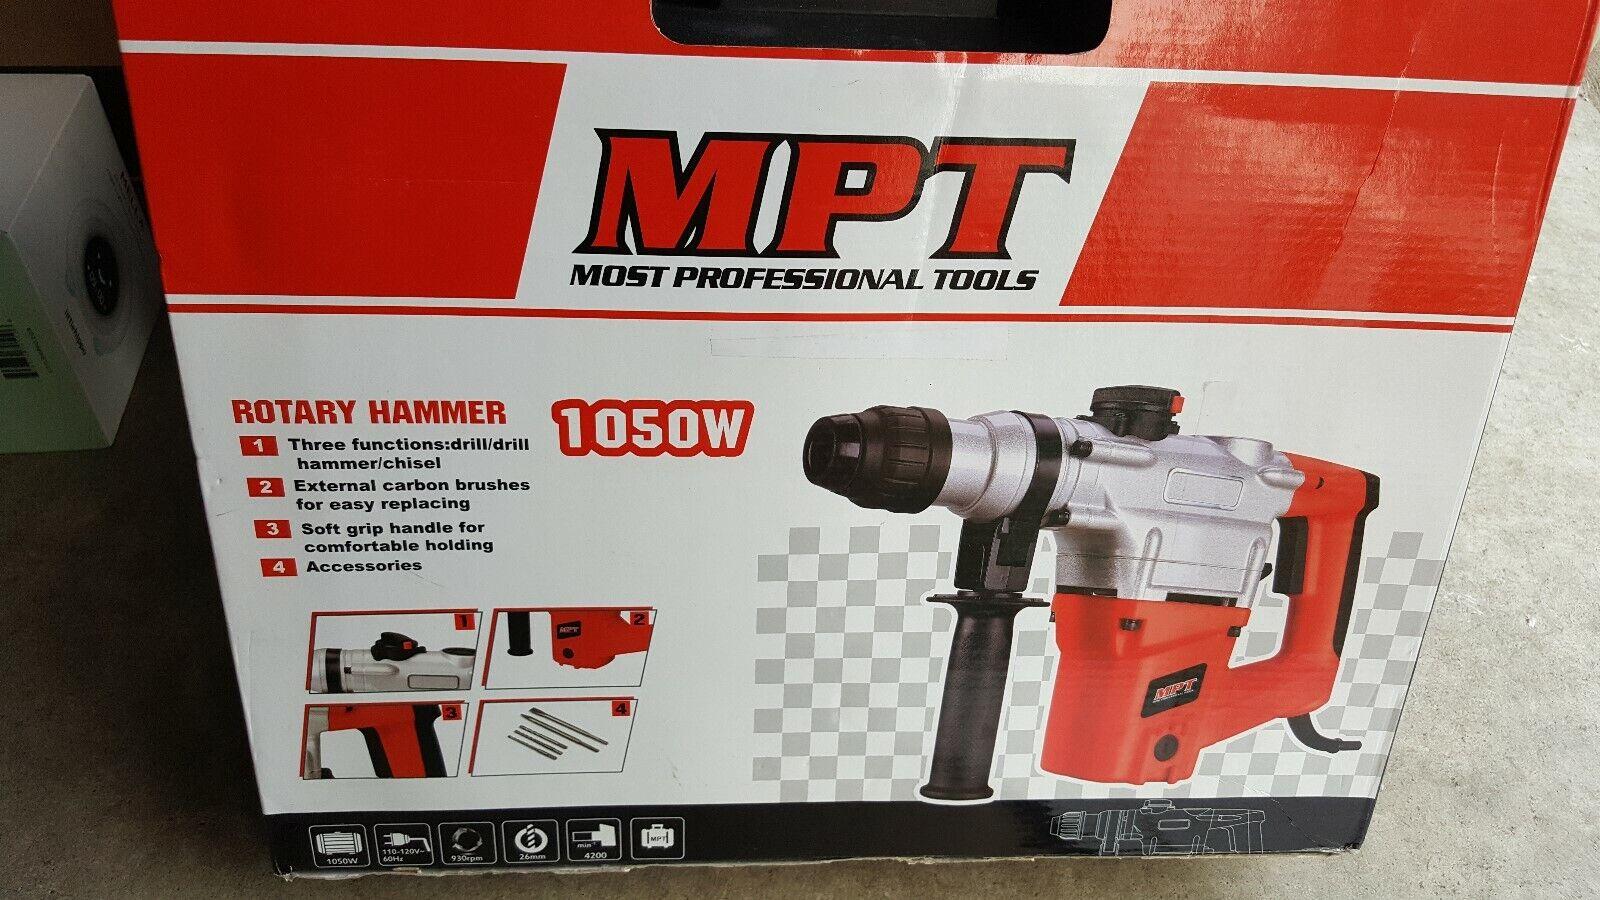 MPT MOST PROFESSIONAL TOOLS ROTARY HAMMER 1050W UMRH2603